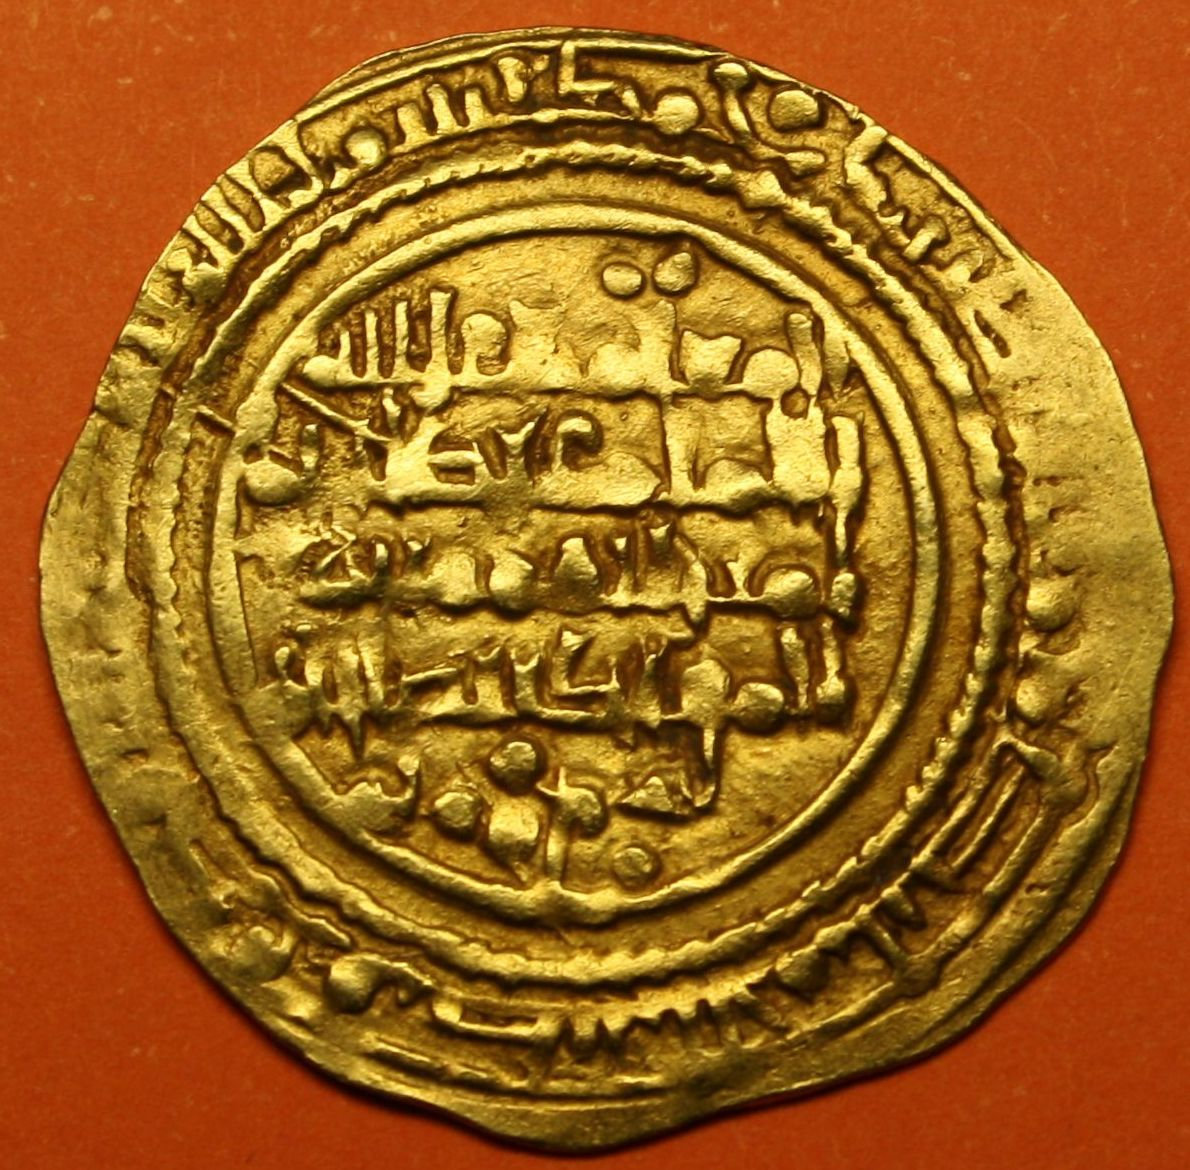 Dinar de Al-Mutamid, 474, Medina Sevilla C9fa52_e6beedf2aeb249fd8c2cb1924deedf43~mv2